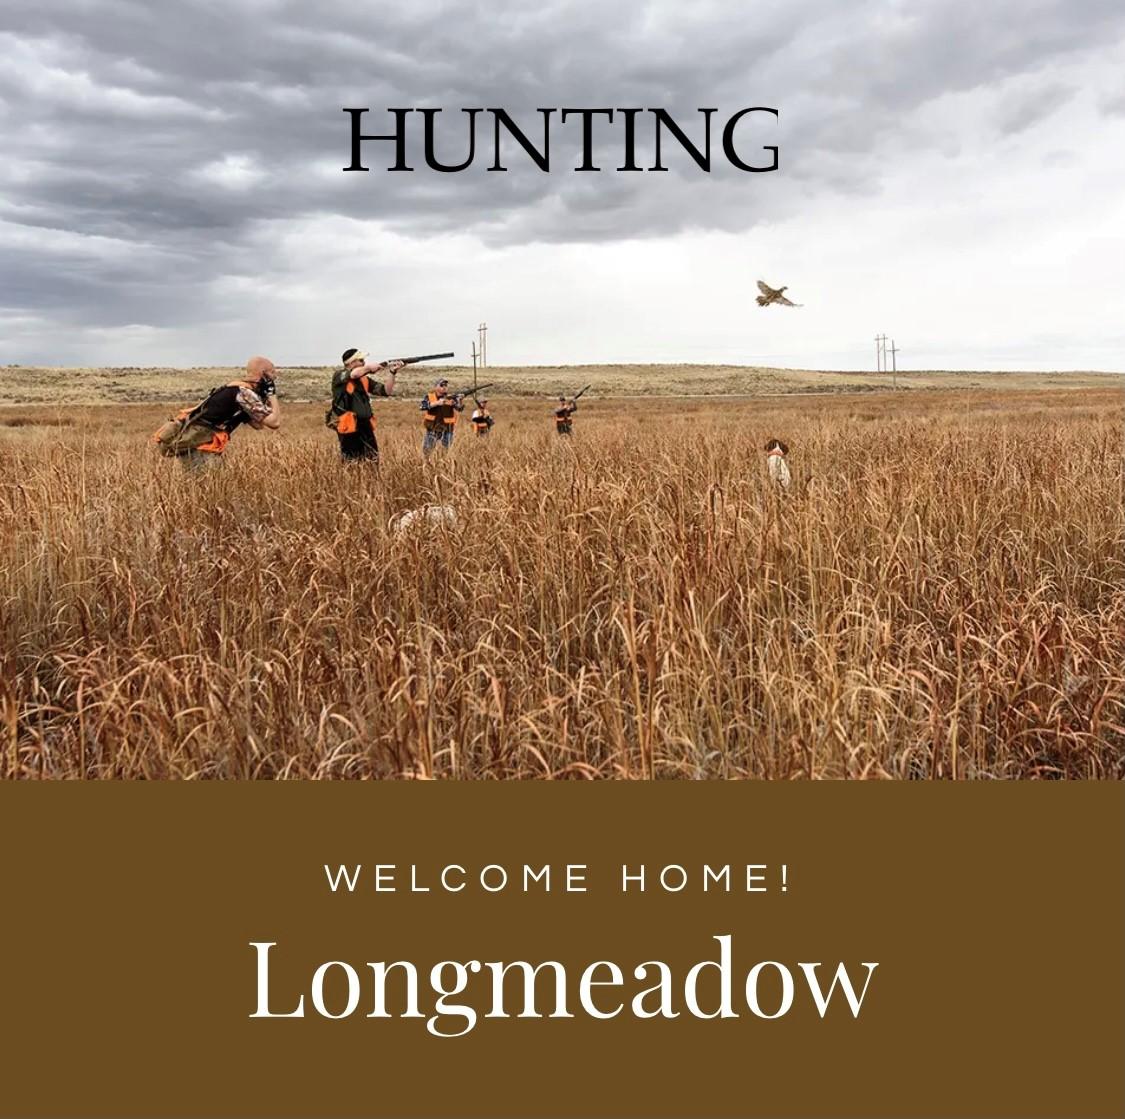 June 26, 2021: Longmeadow Game Resort – Best of the West Long Range Shooting Class – The Infinite Outdoors Project